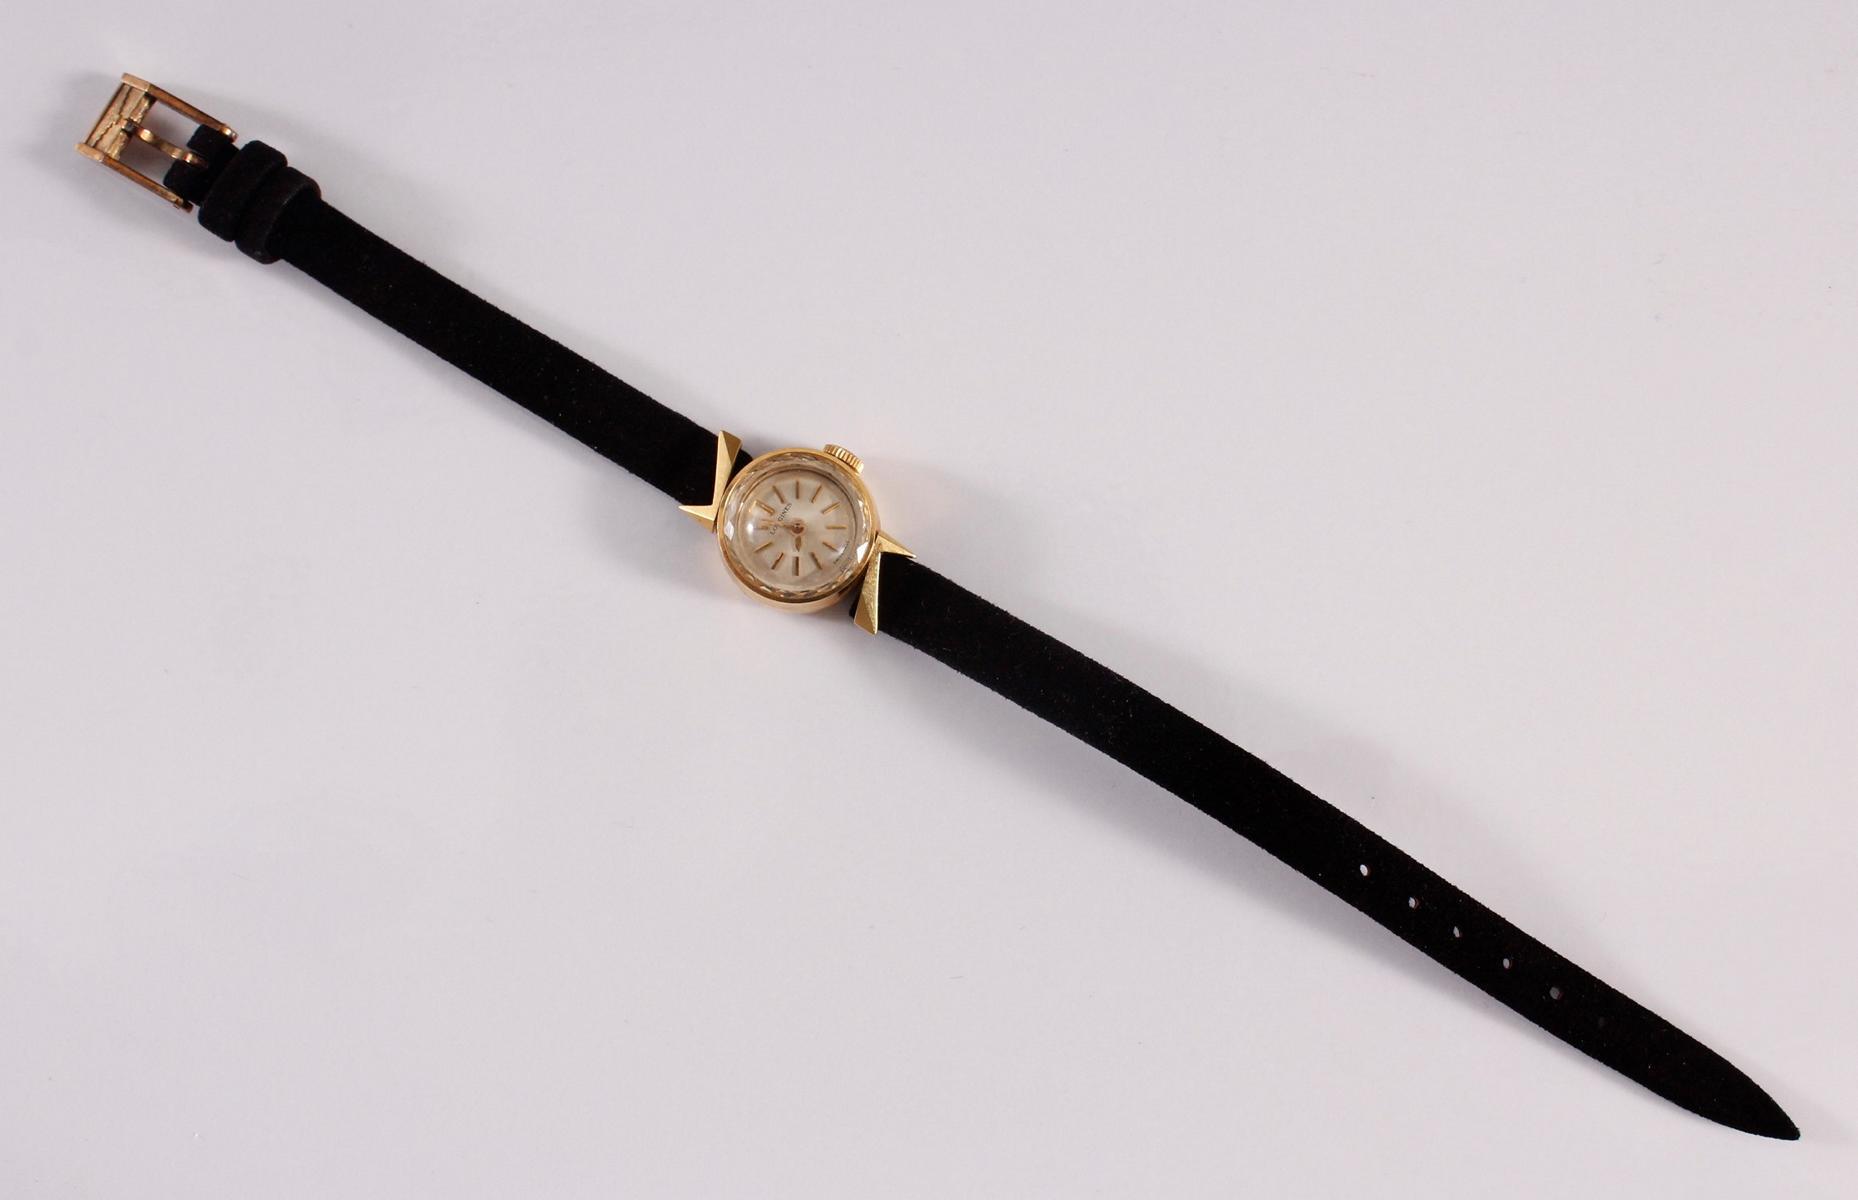 Longine Damenarmbanduhr, 18 Karat Gelbgold